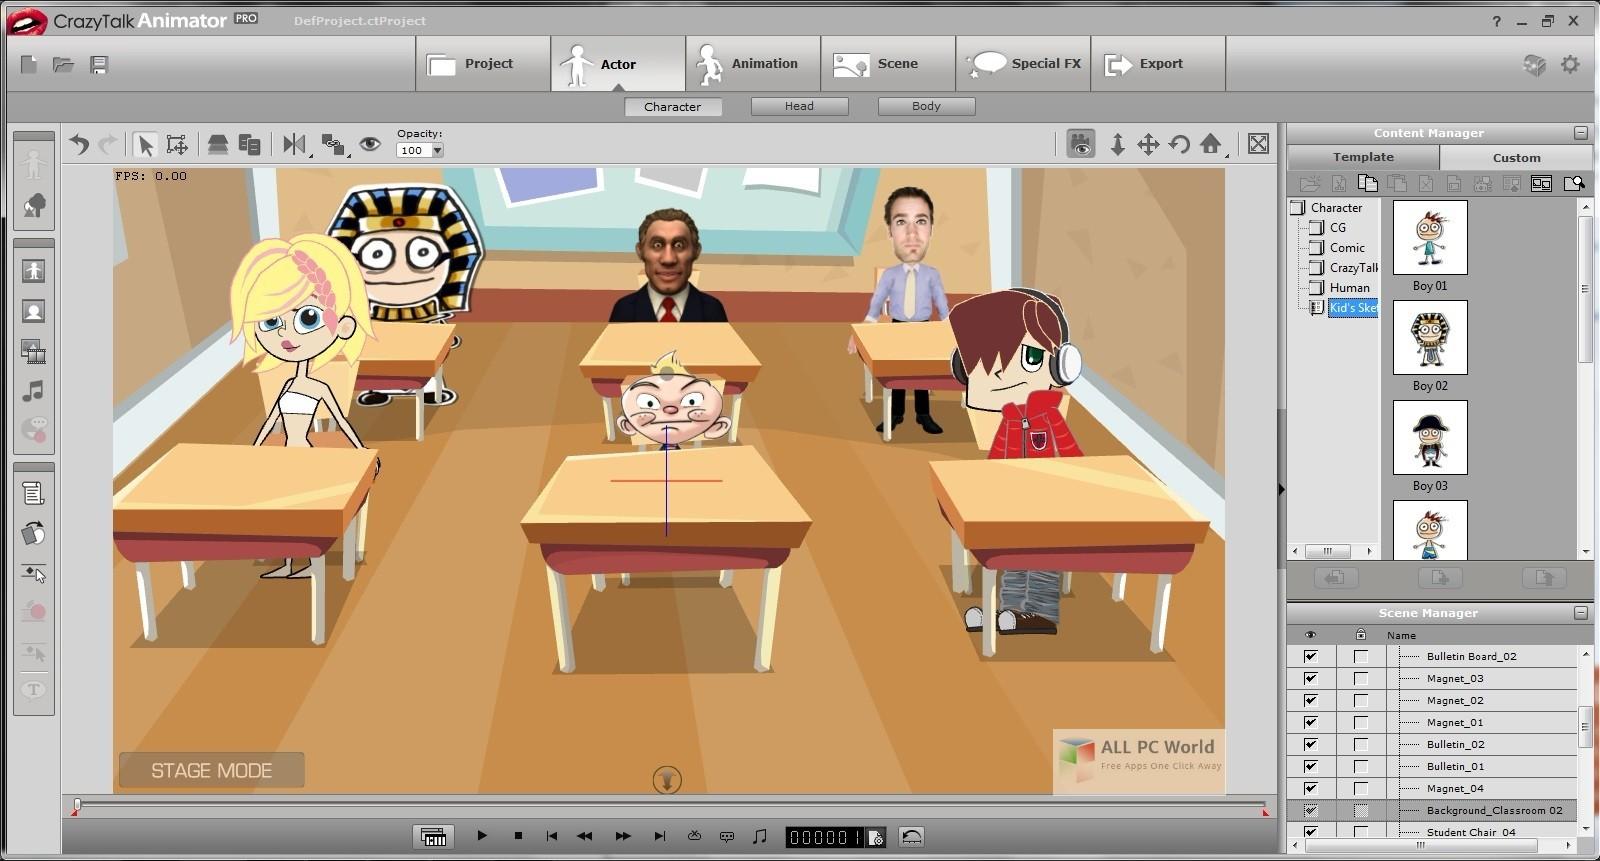 Download Reallusion CrazyTalk Animator 3 22 Free - ALL PC World